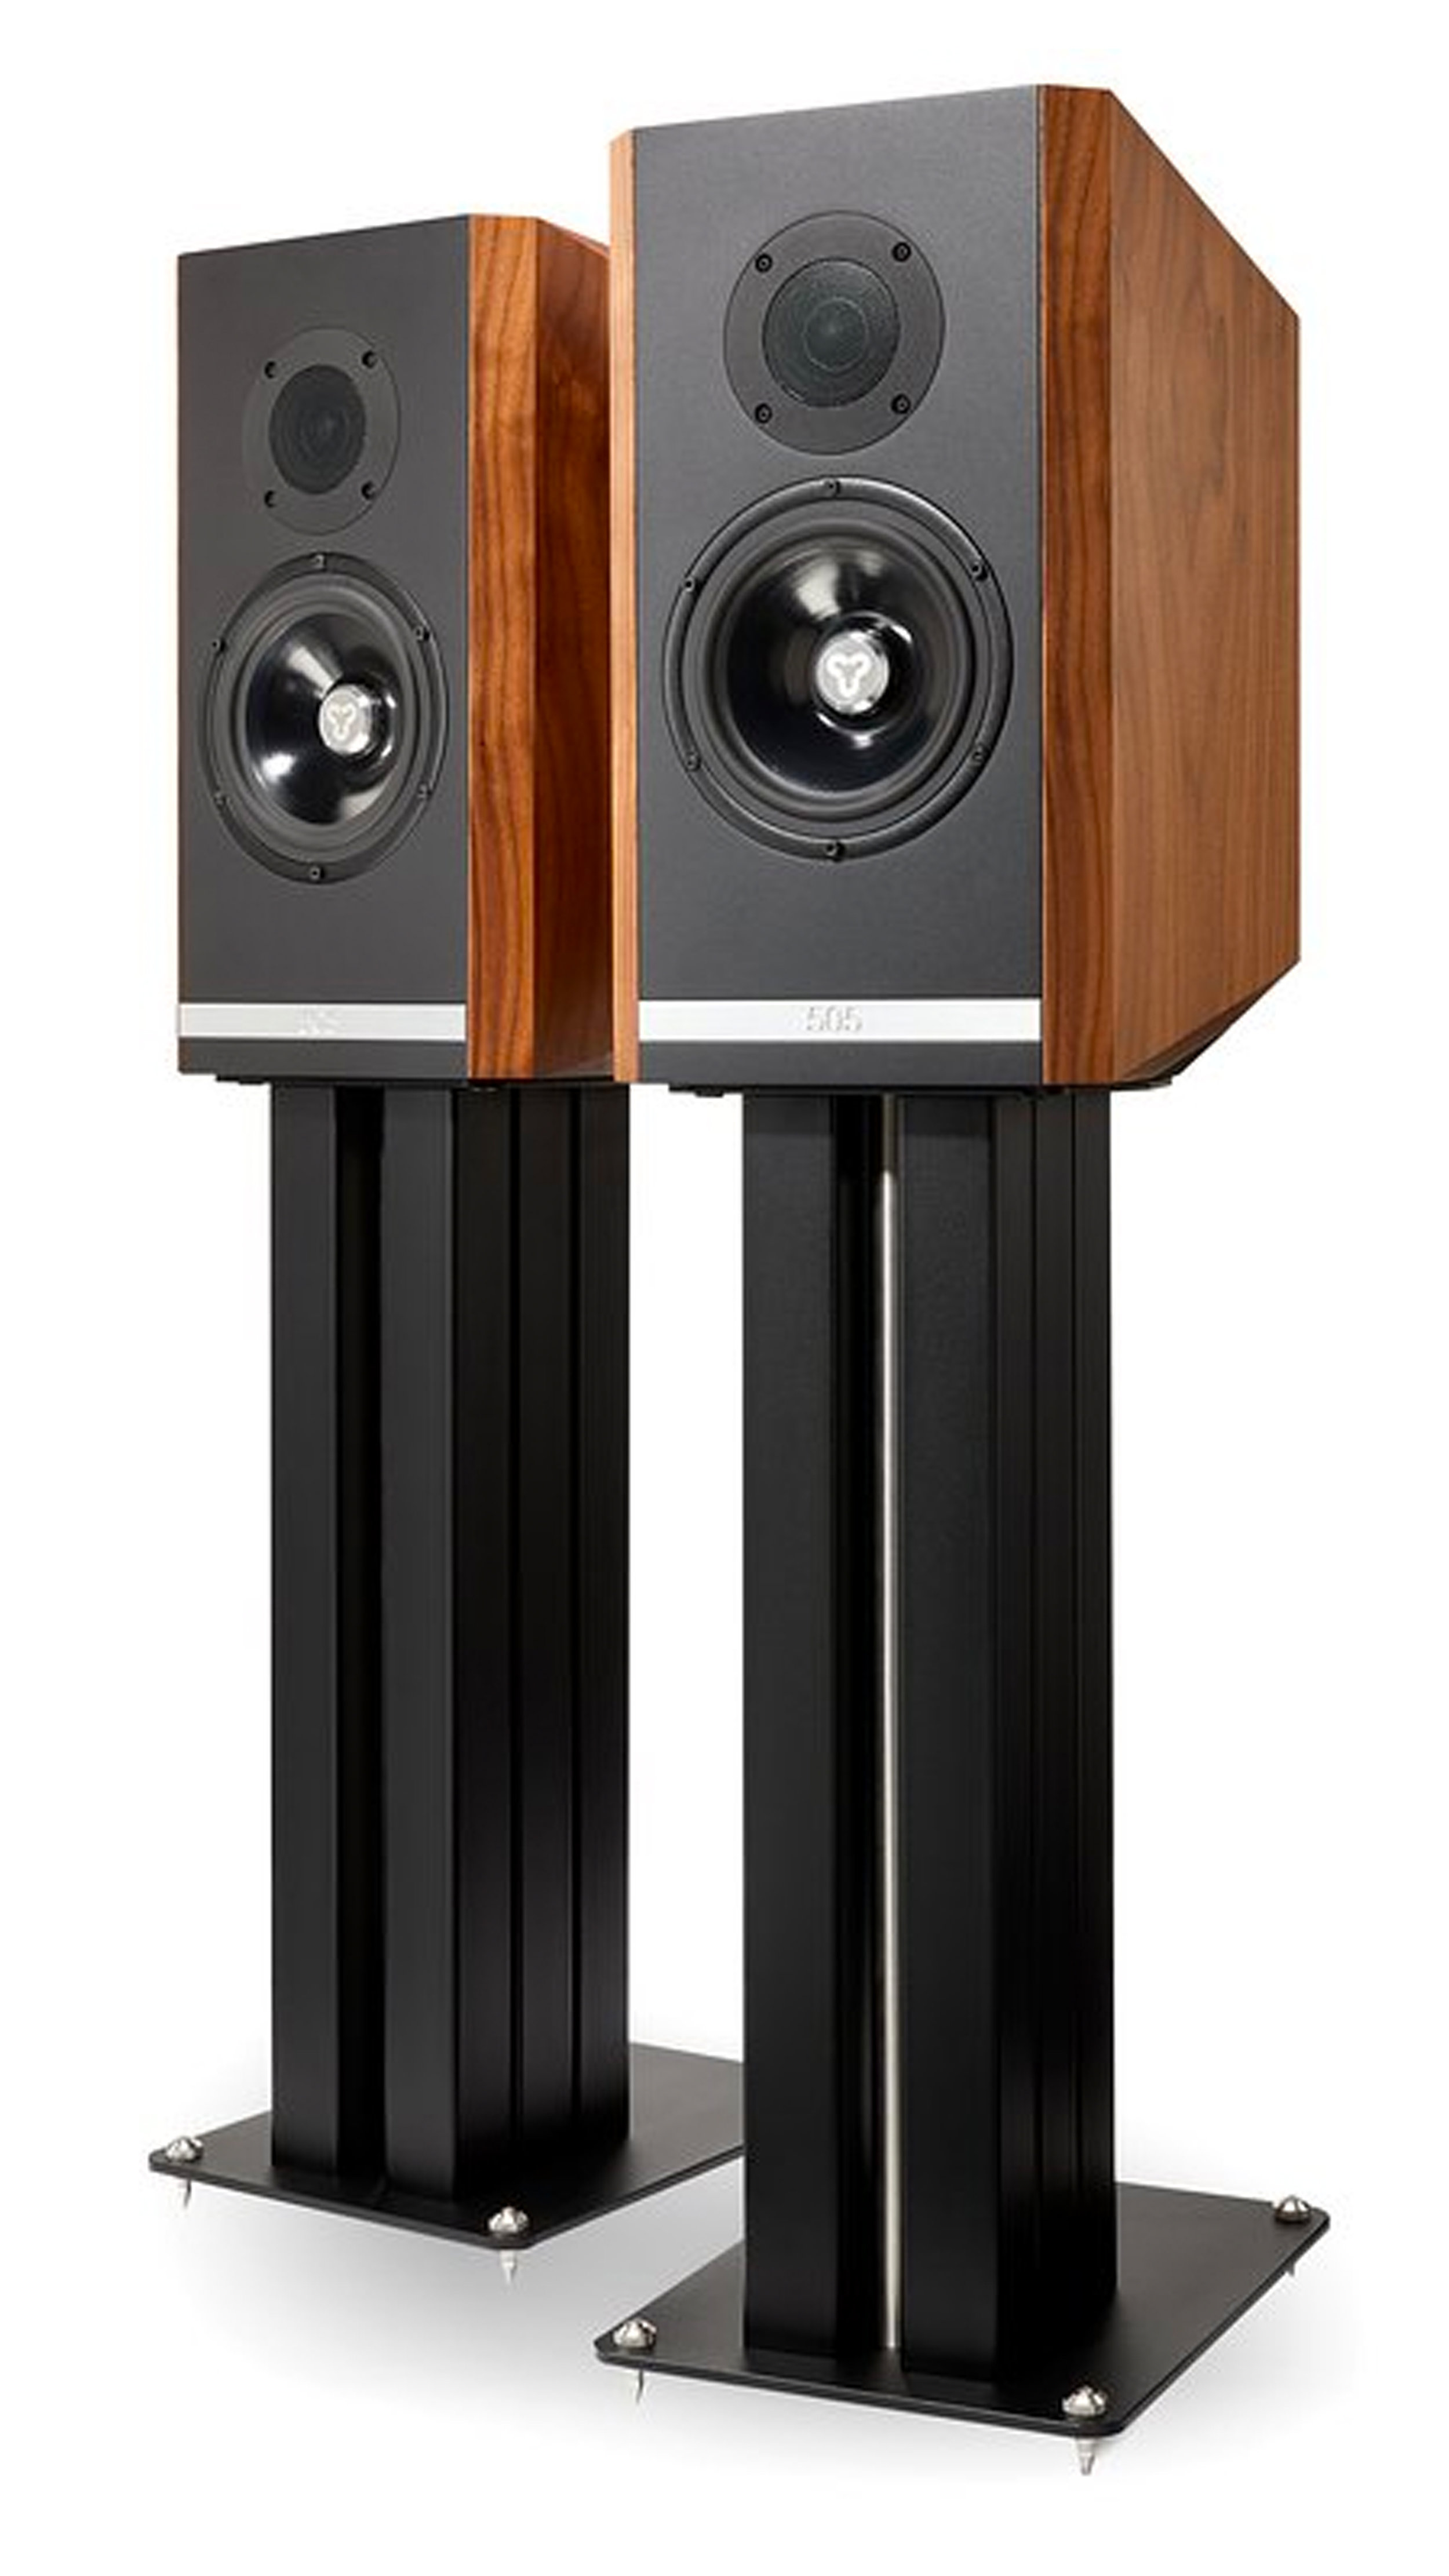 Titan 505 - £7,000 (ex. stands)